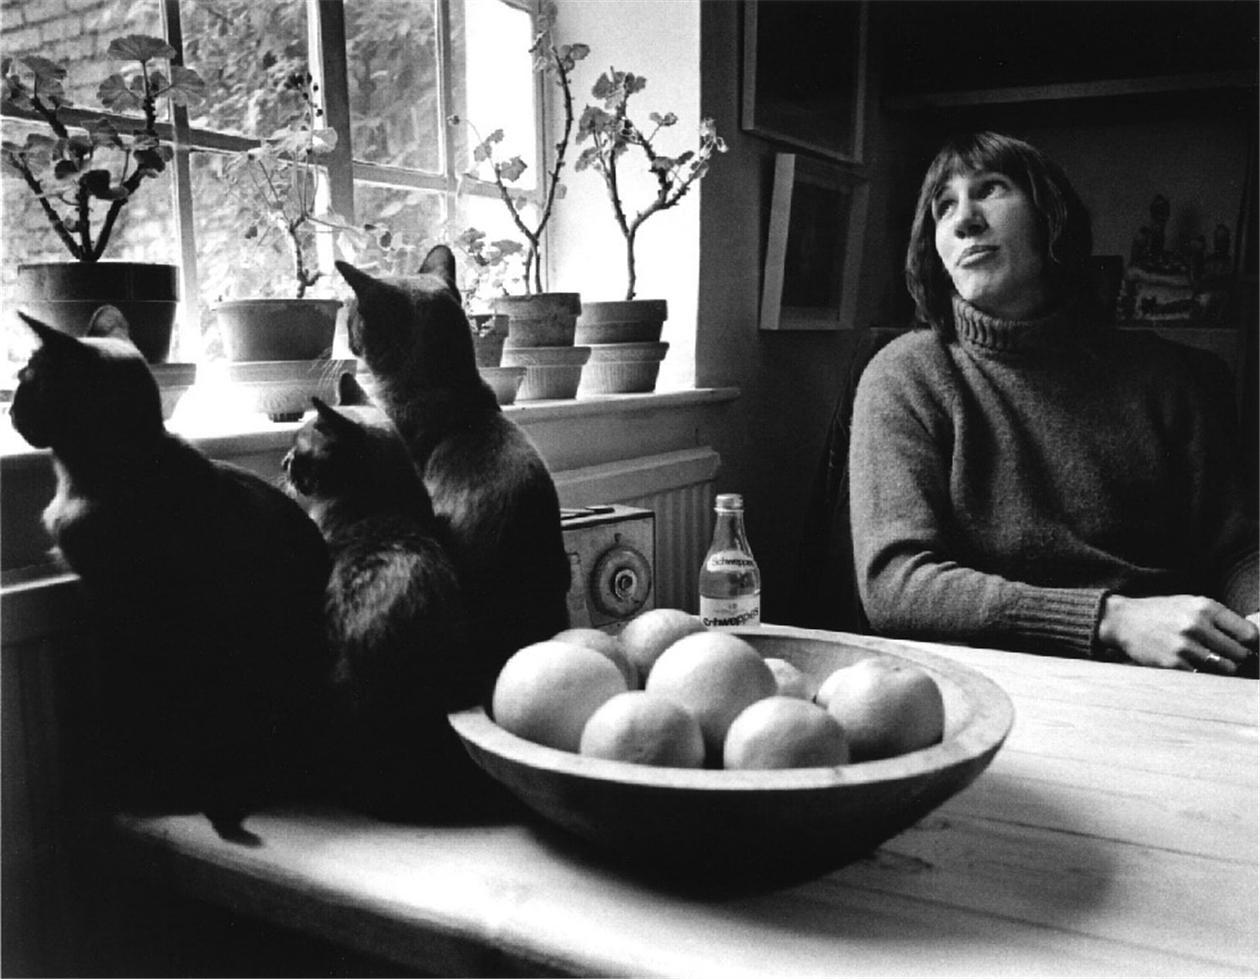 1970. Роджер Уотерс, Лондон